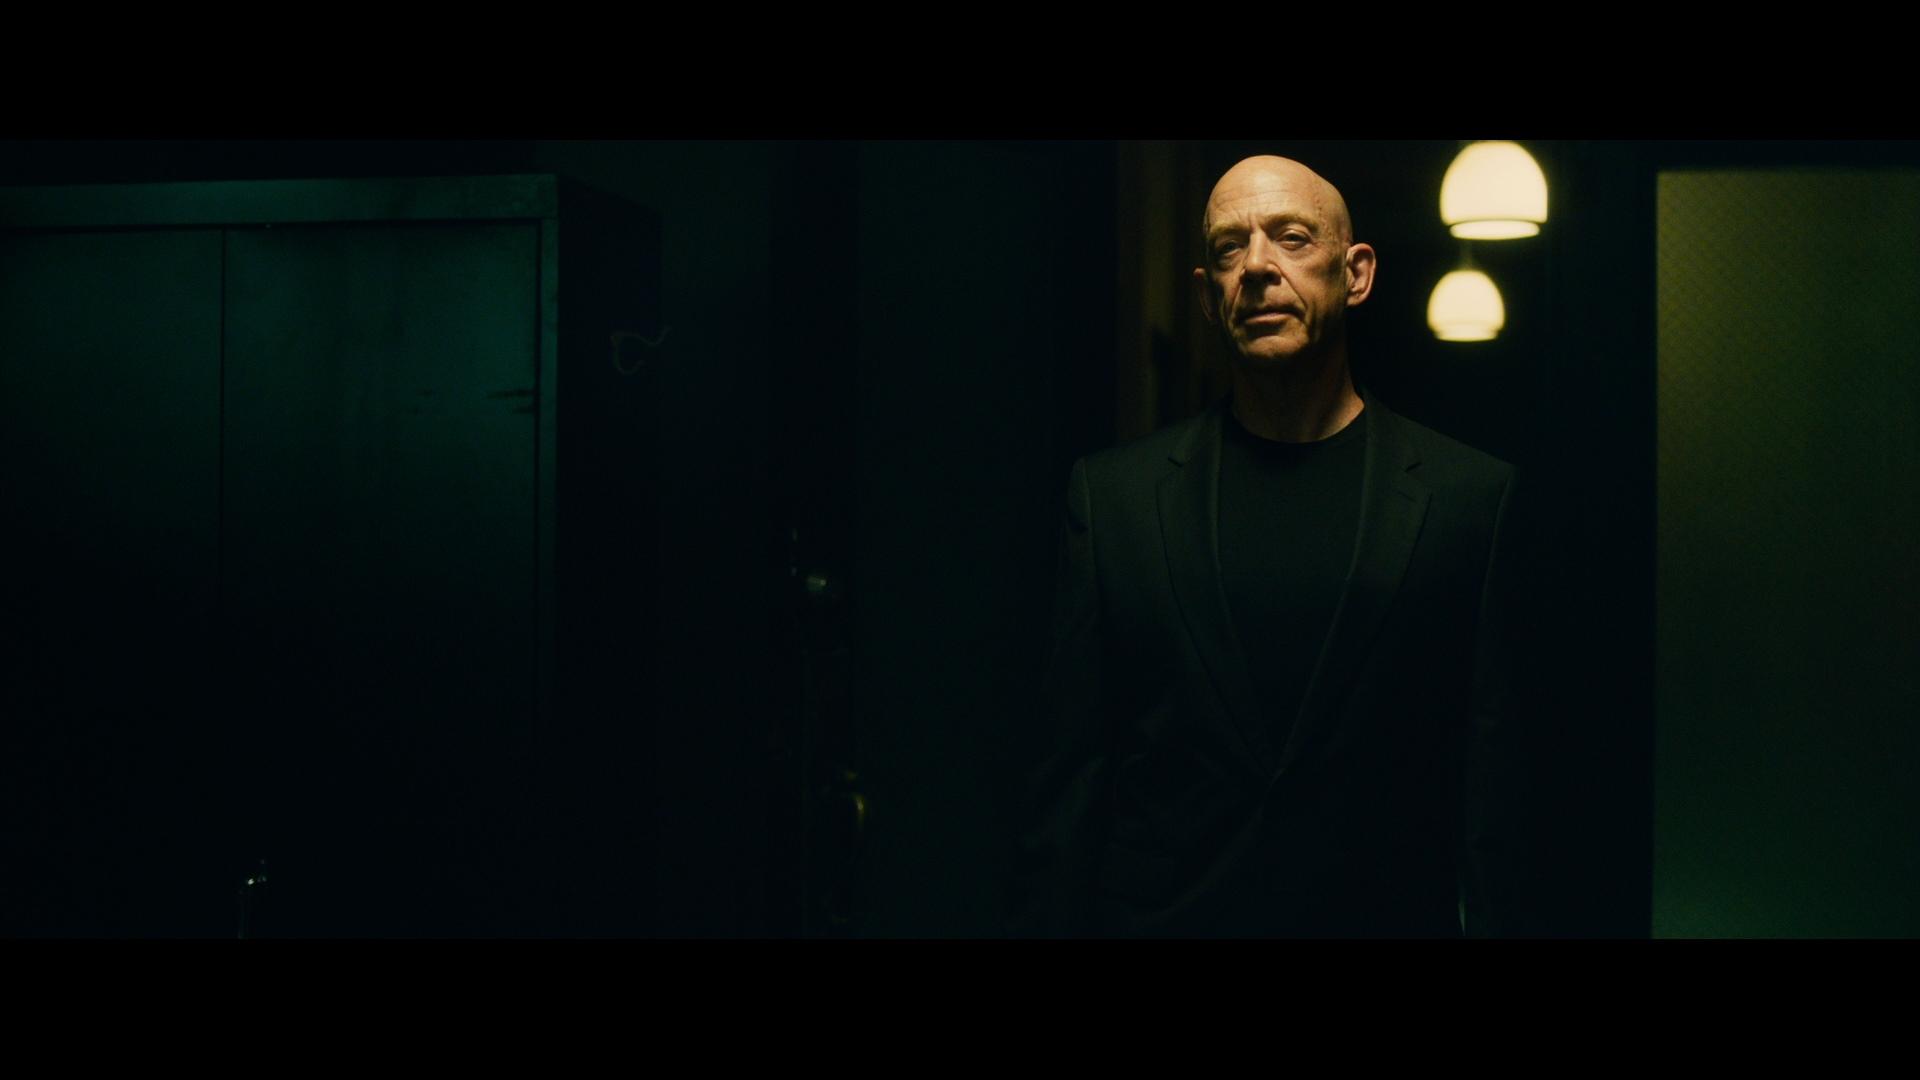 https://i1.wp.com/www.dvdbeaver.com/film5/blu-ray_reviews_66/whiplash_blu-ray_/large/large_whiplash_01_blu-ray_.jpg